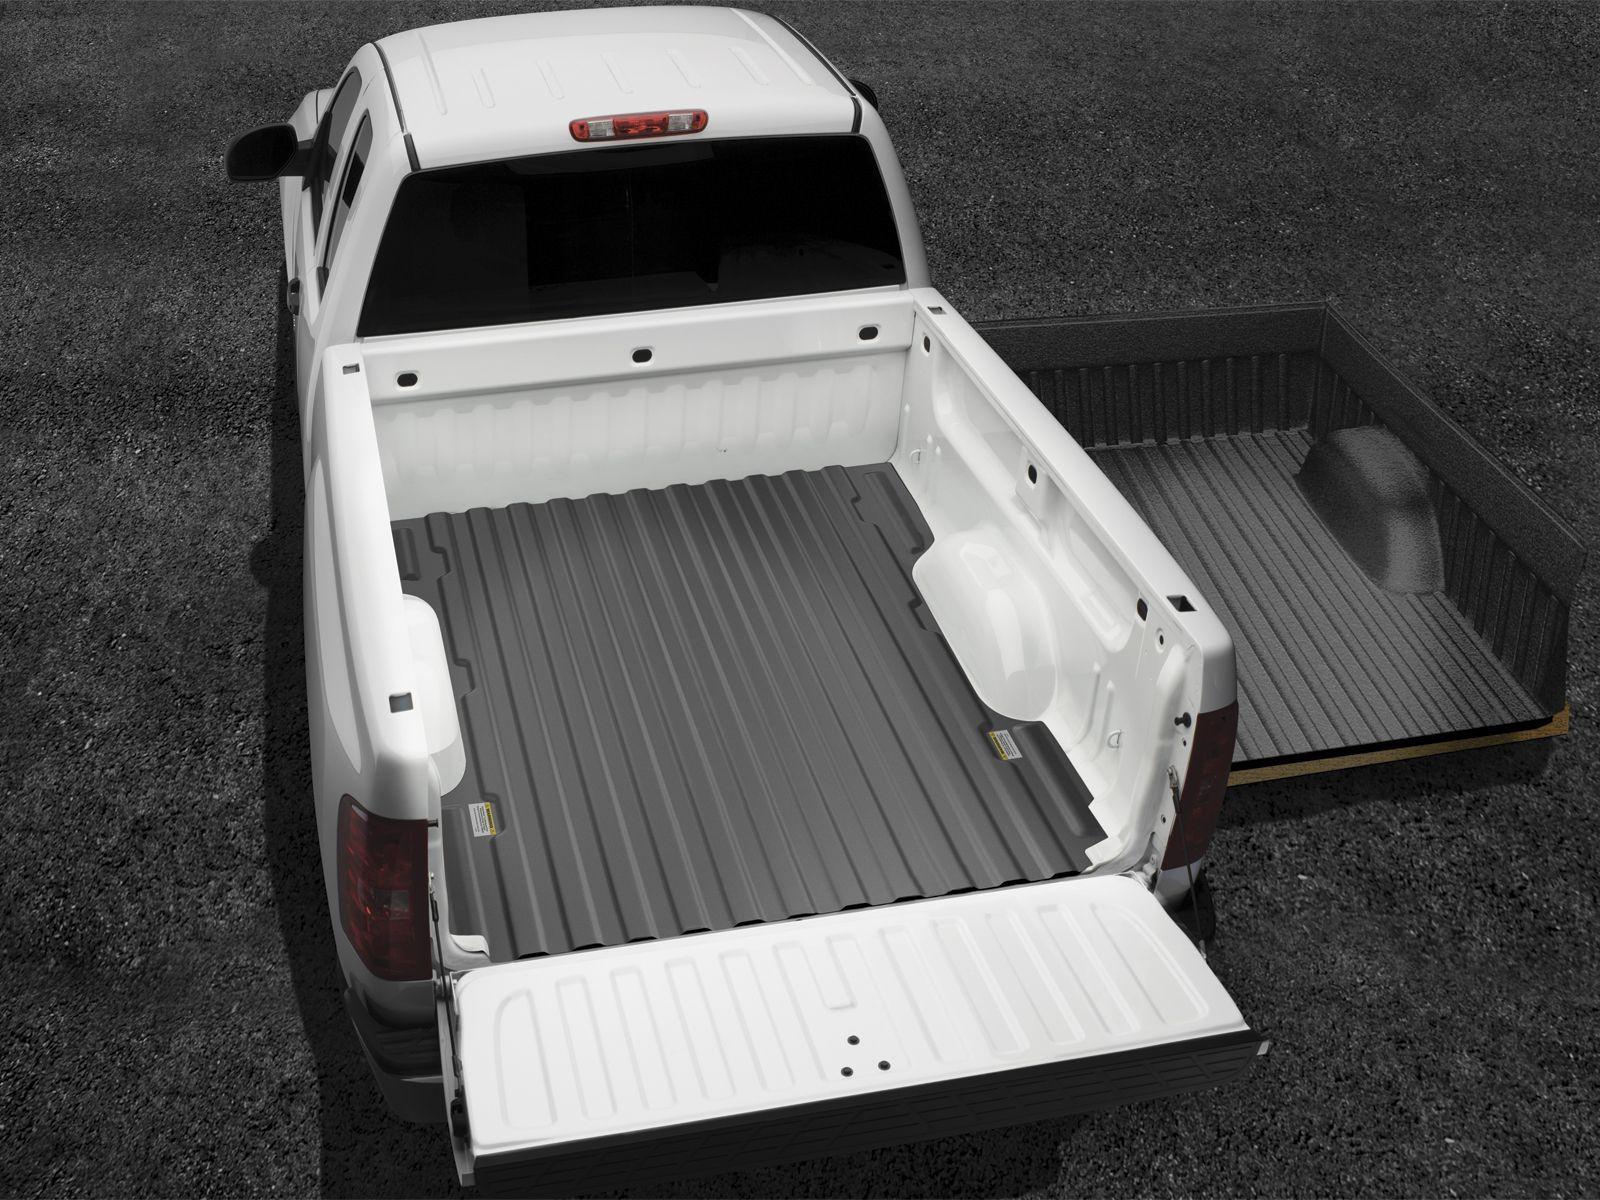 UnderLiner in 2020 Bed liner, Truck bed liner, Truck bed